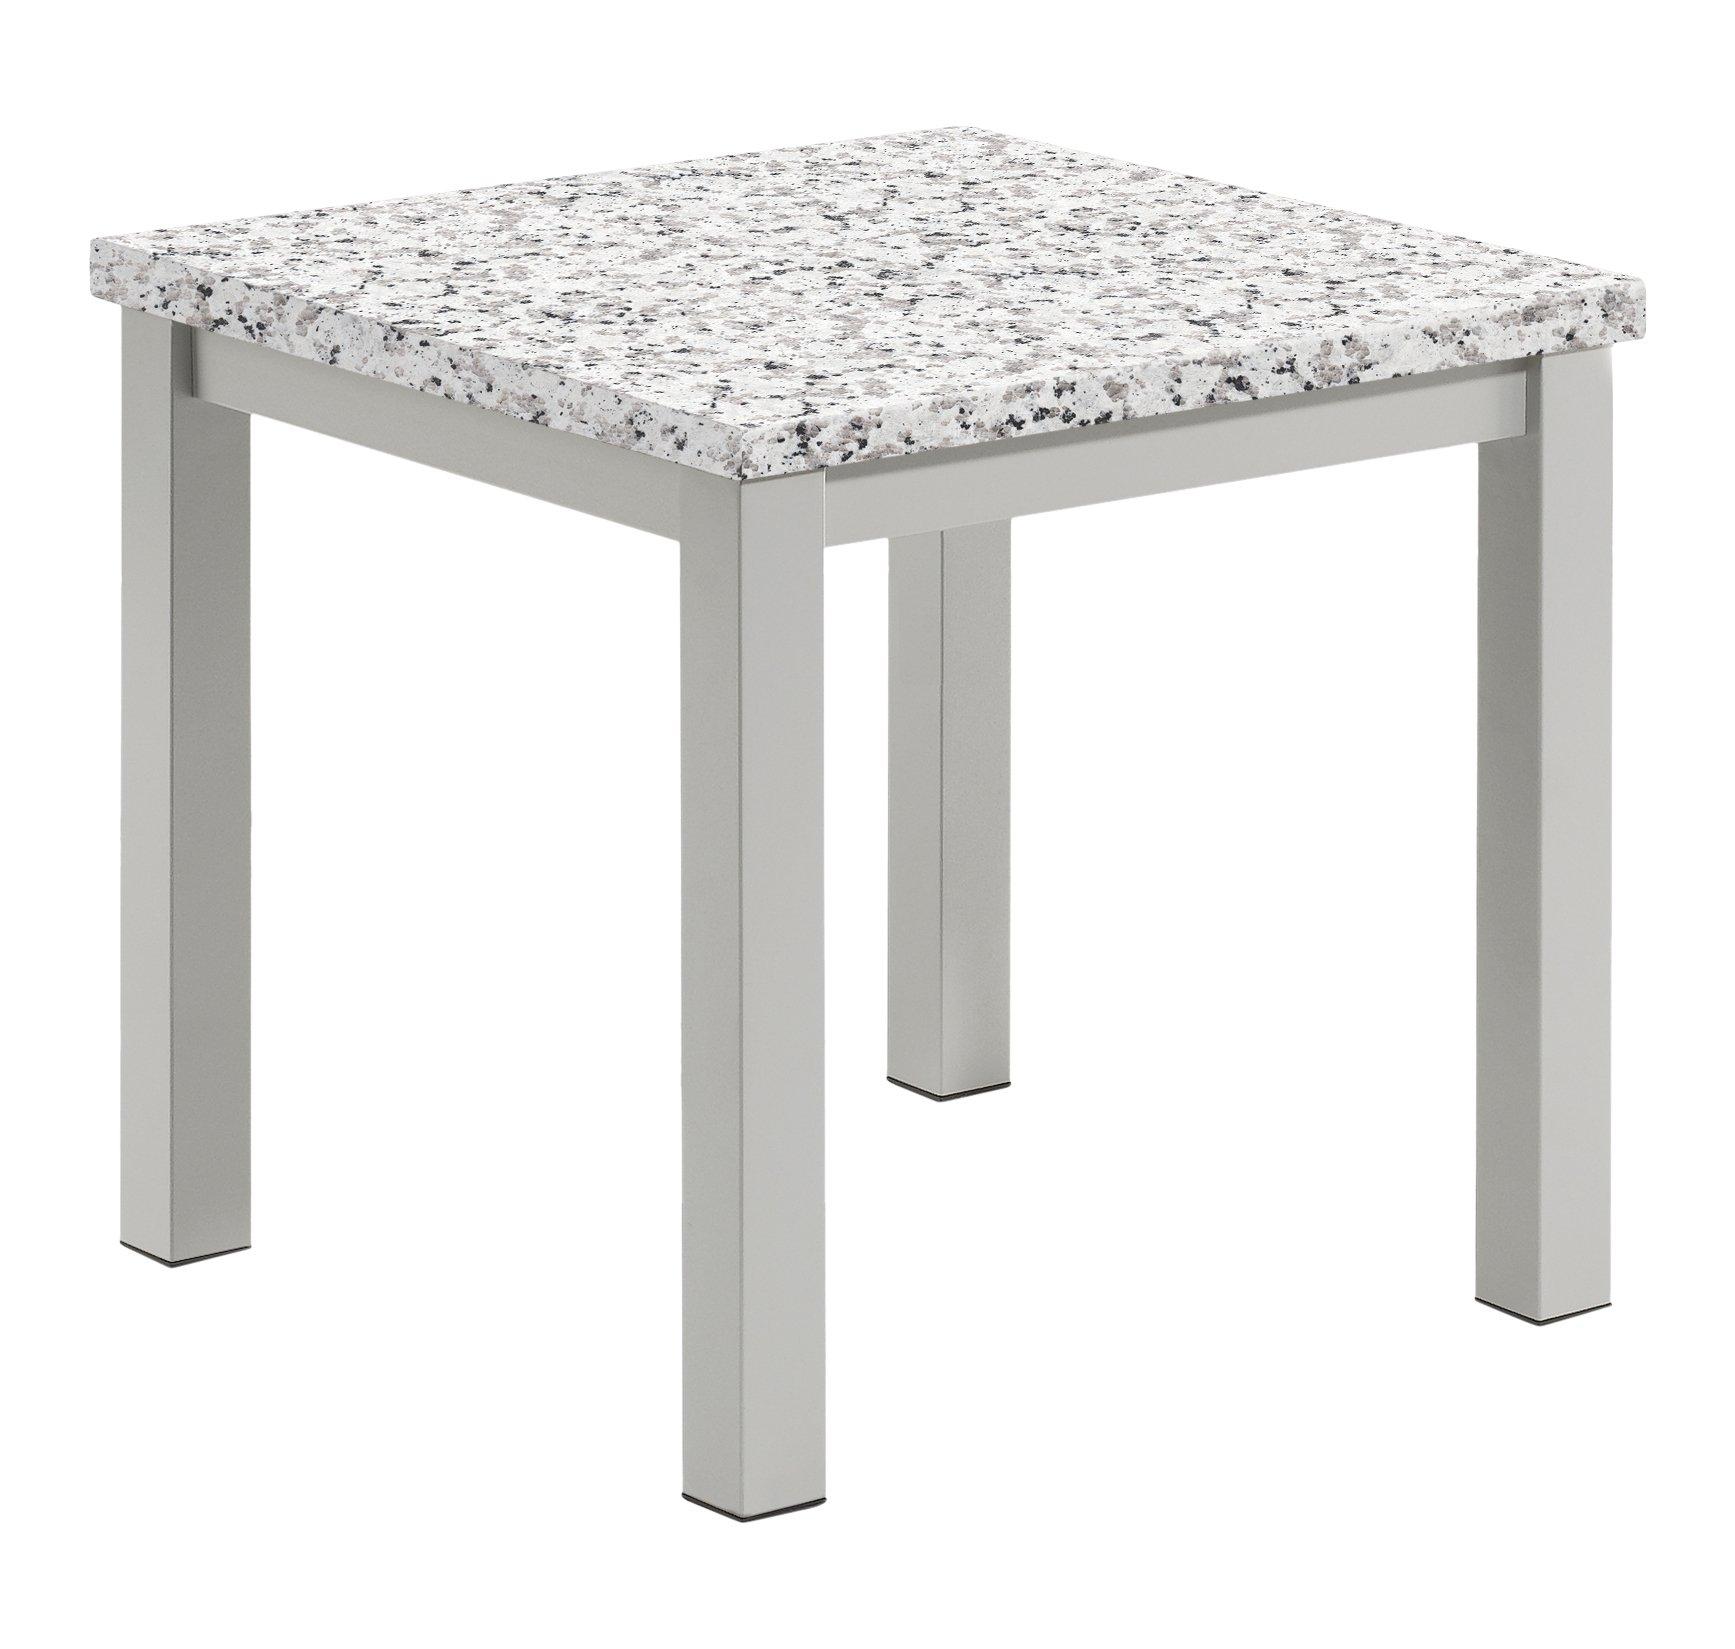 Amazon Com Oxford Garden Tveth Powder Coated Aluminum Frame Lite Core Granite Ash Top Travira End Table Garden Outdoor